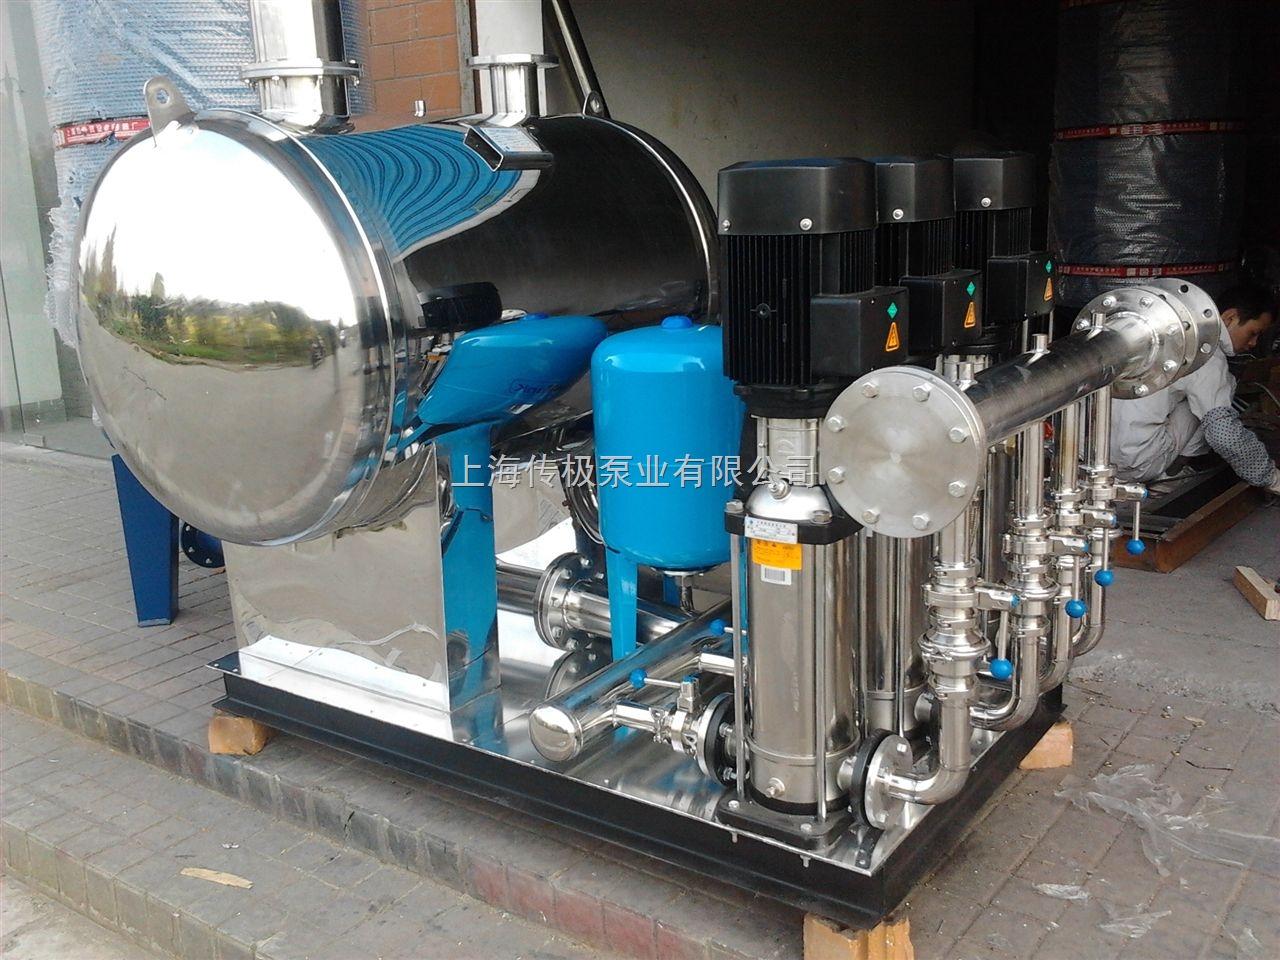 380v集水井抽水泵电路图